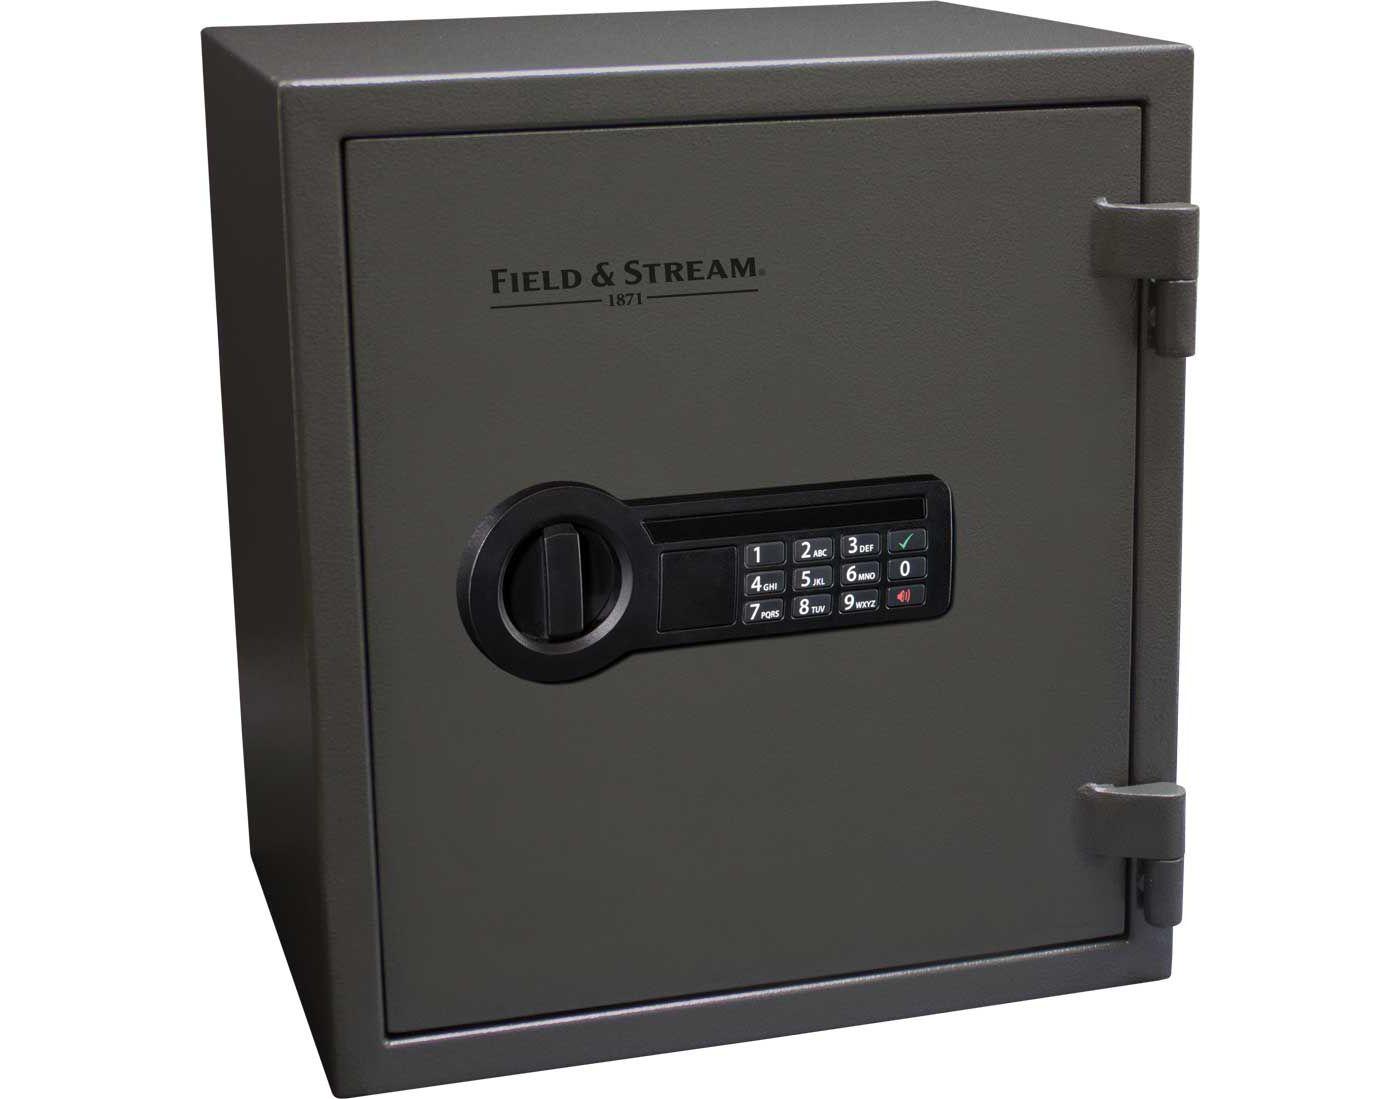 Field & Stream Personal Fire Safe – Medium